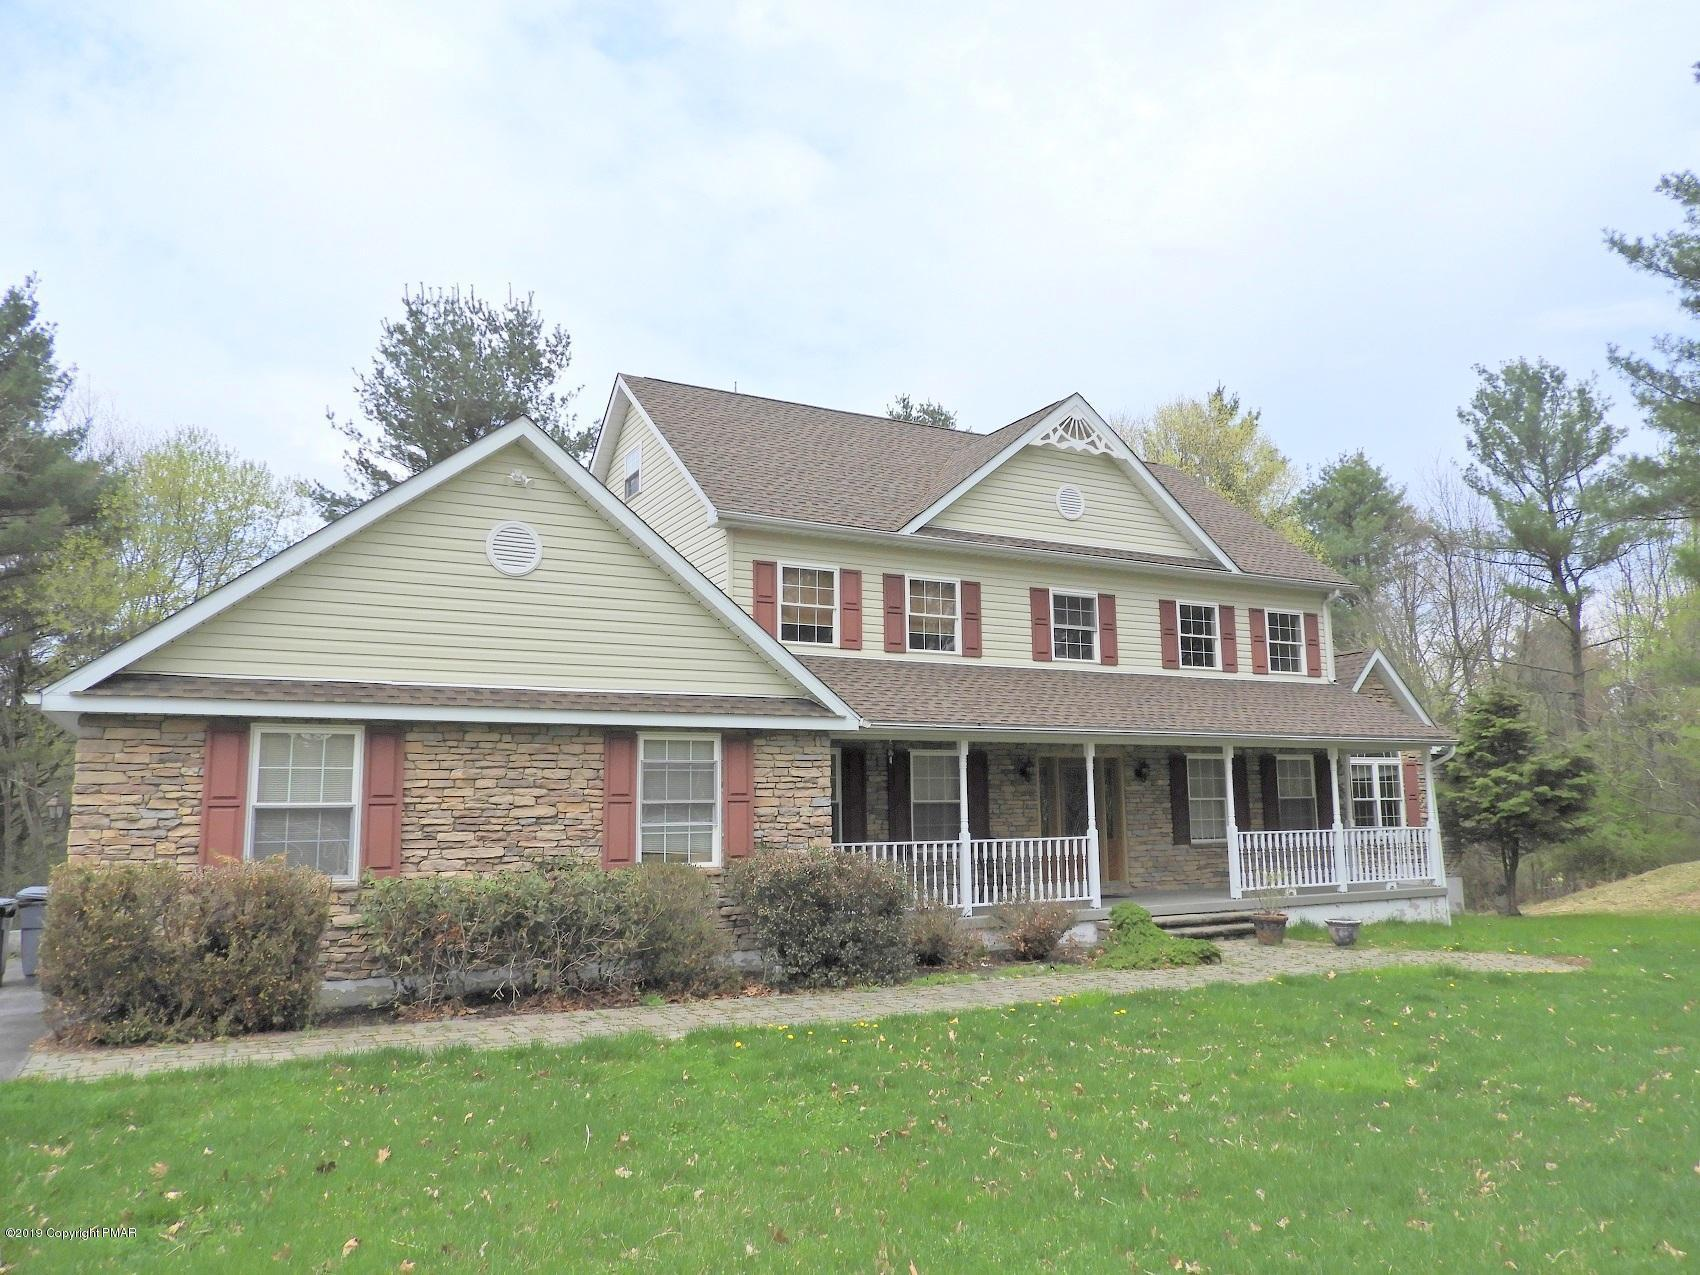 4022 Manor Dr, Stroudsburg, PA 18360